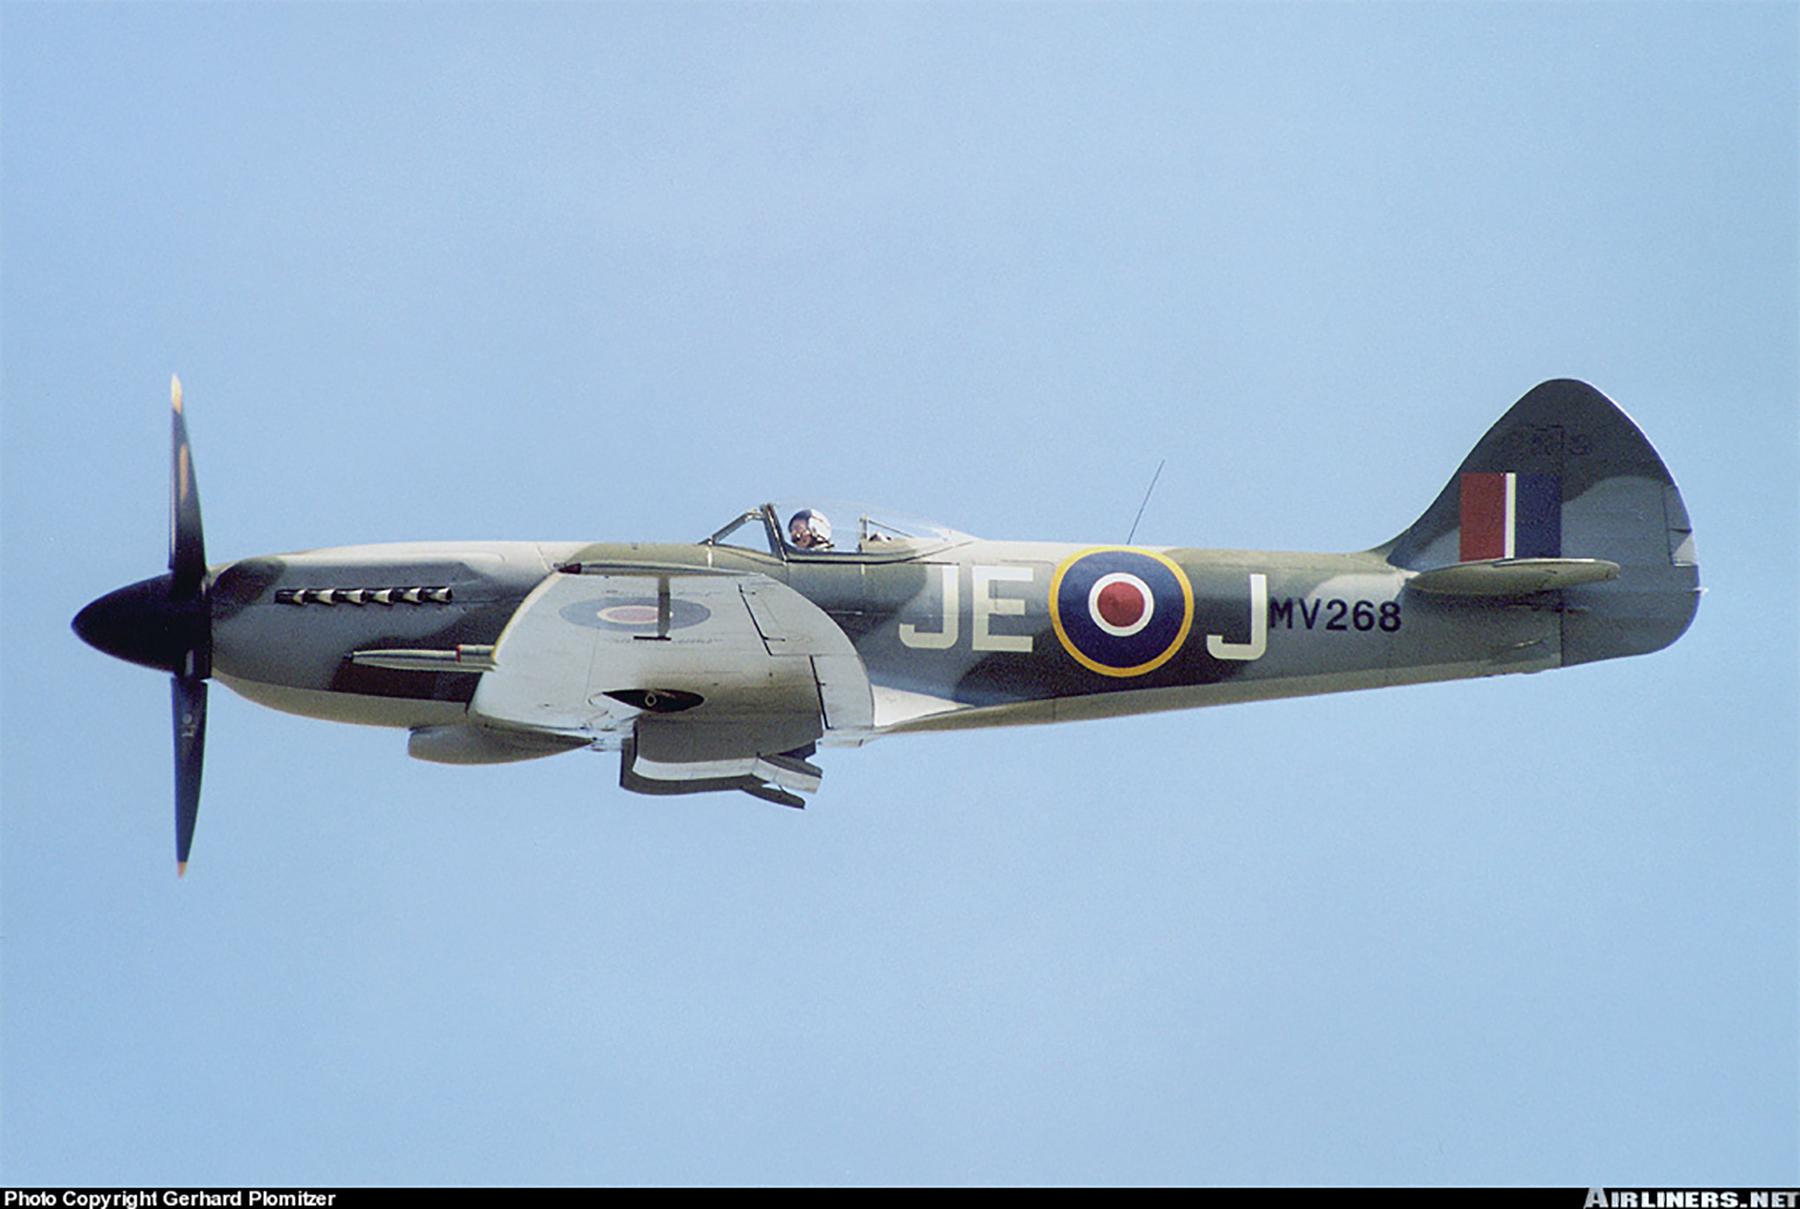 Airworthy Spitfire warbird RAF 91Sqn JEJ MV268 01